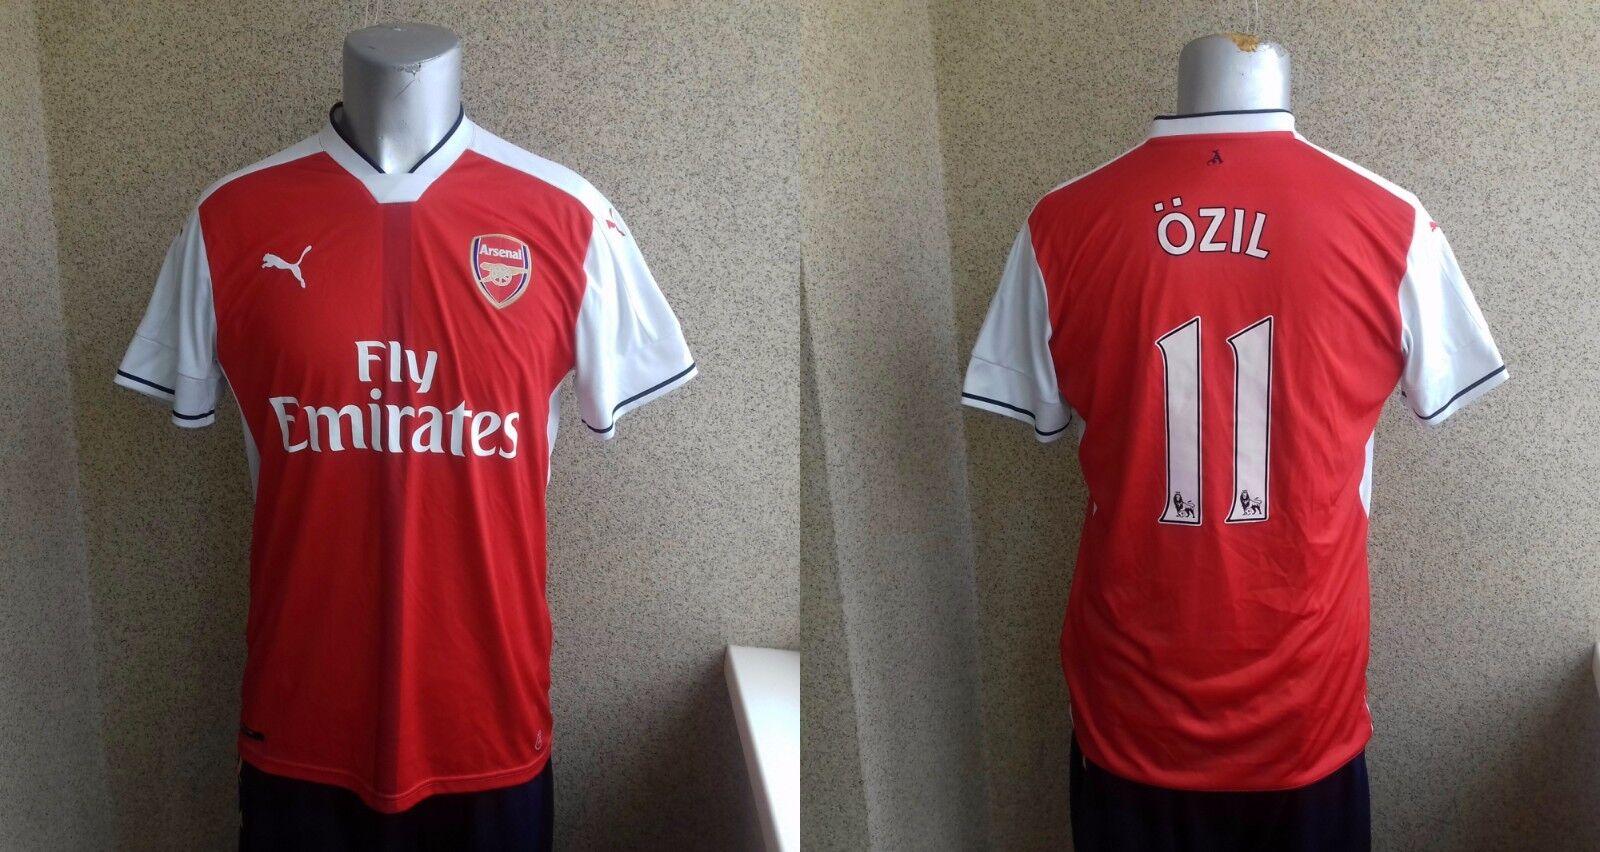 Mesut Özil Arsenal Londres 2016 2017 Hogar Camiseta De Fútbol L Jersey Puma Soccer